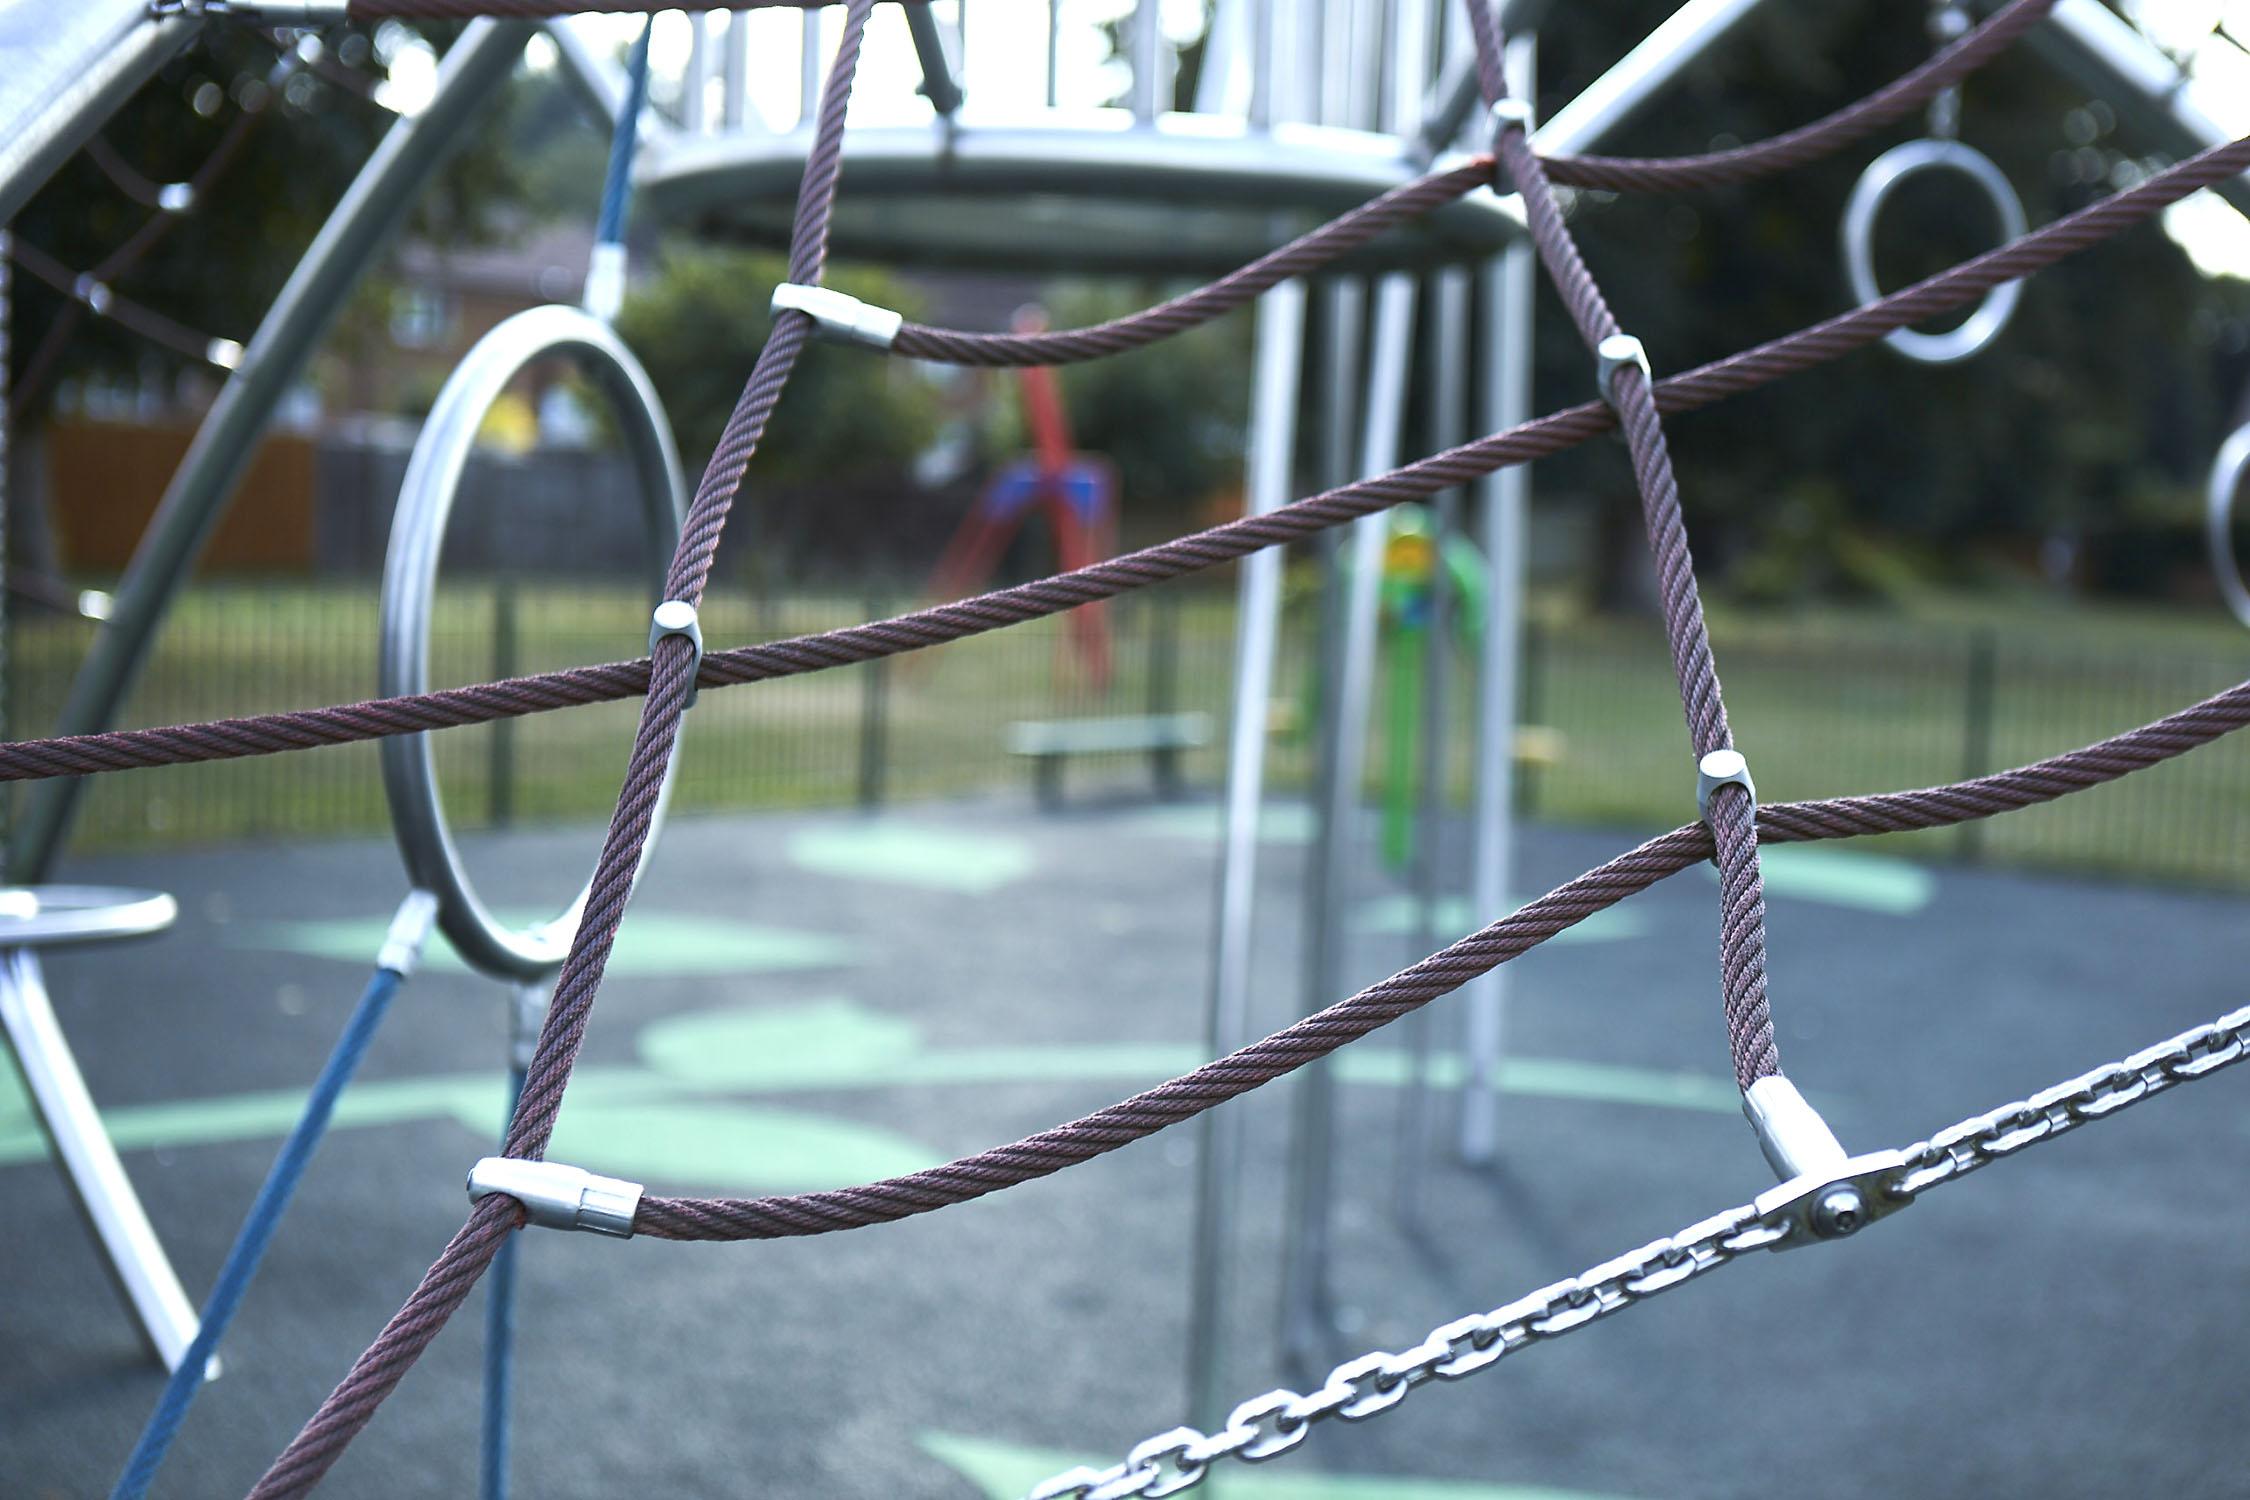 Henley Town Council - Freeman's Meadow play park